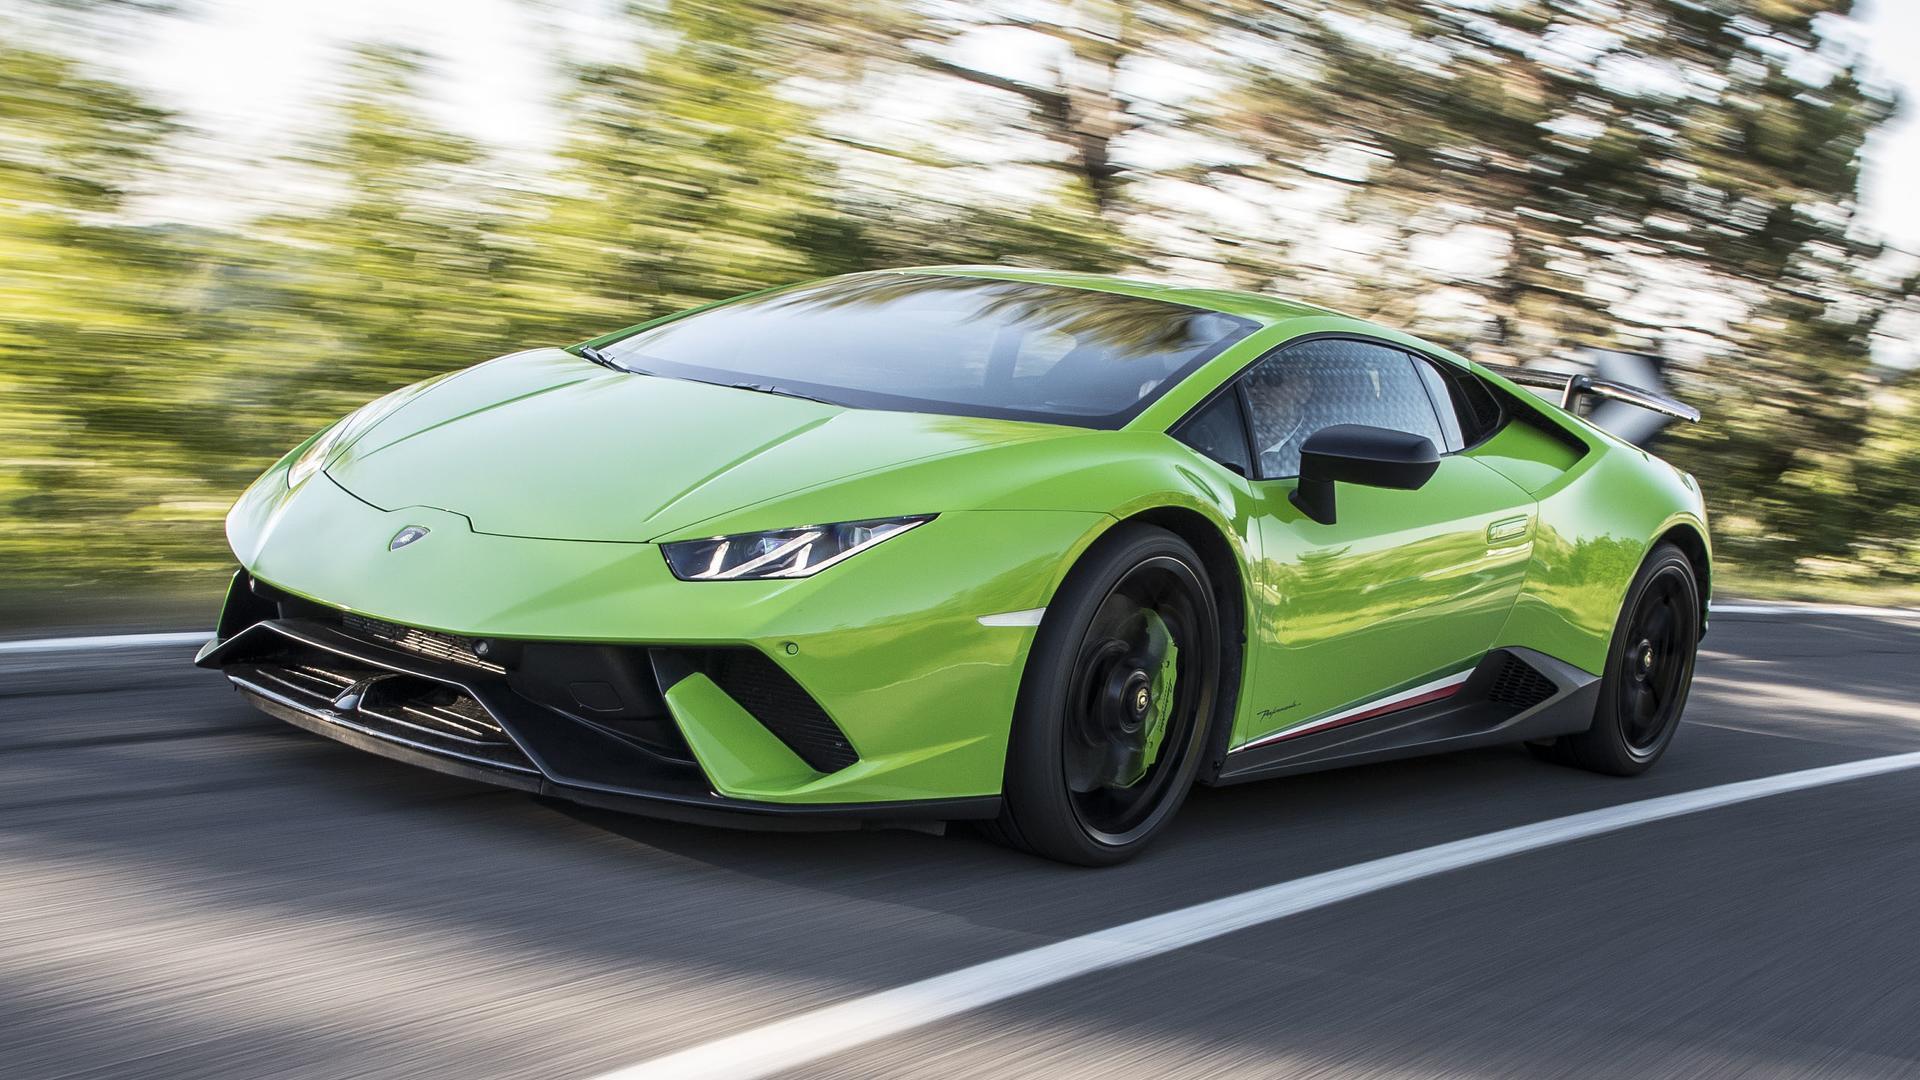 9. Lamborghini Huracan Performante